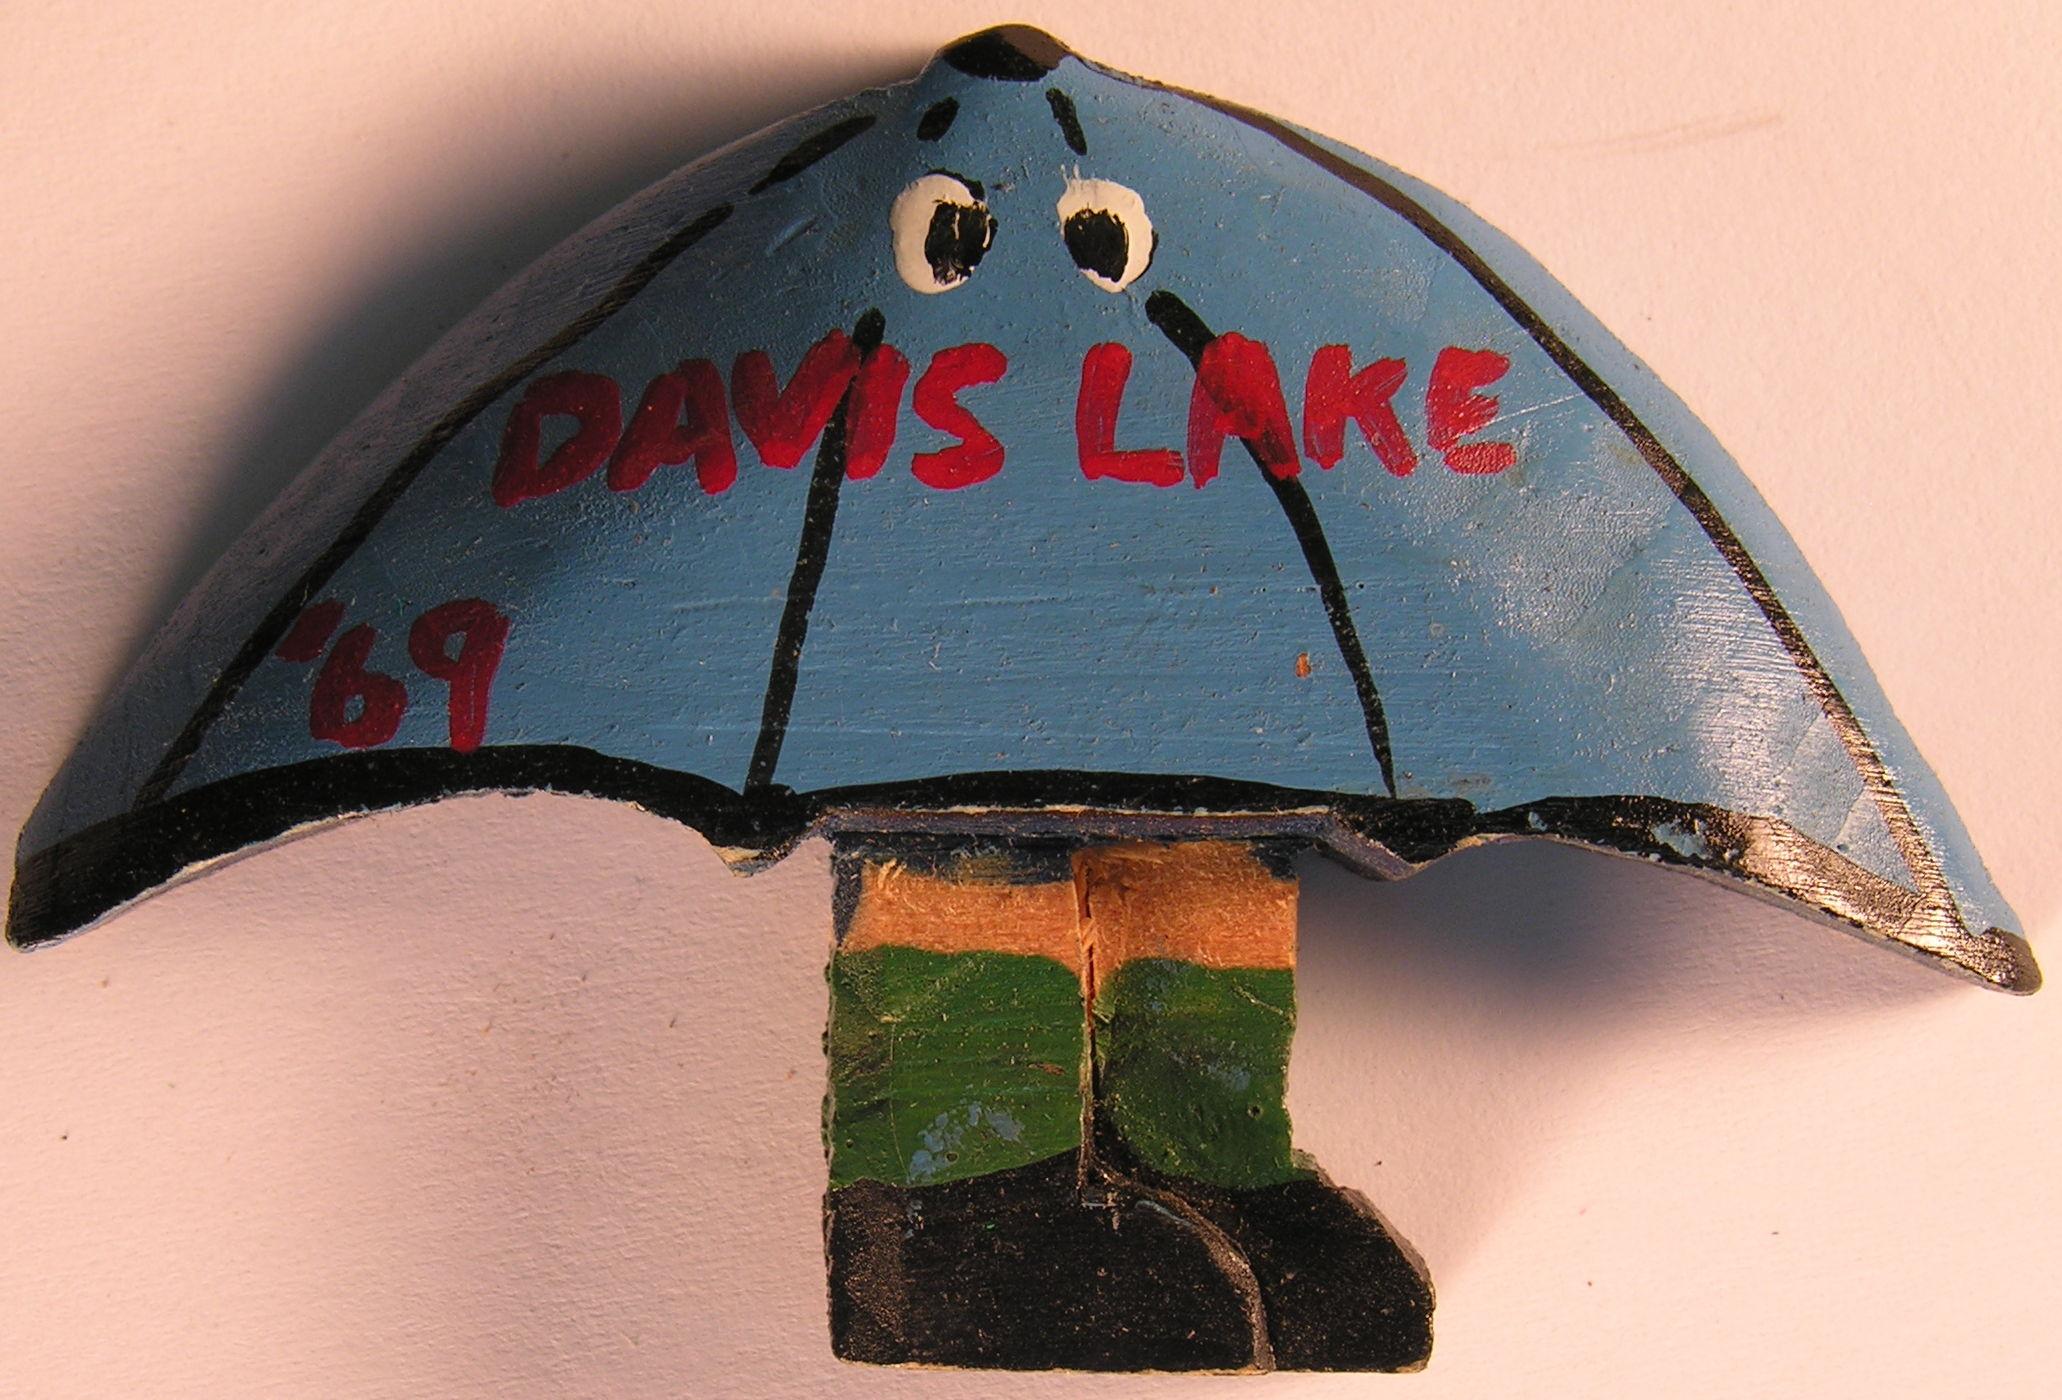 Camp Davis Lake-04